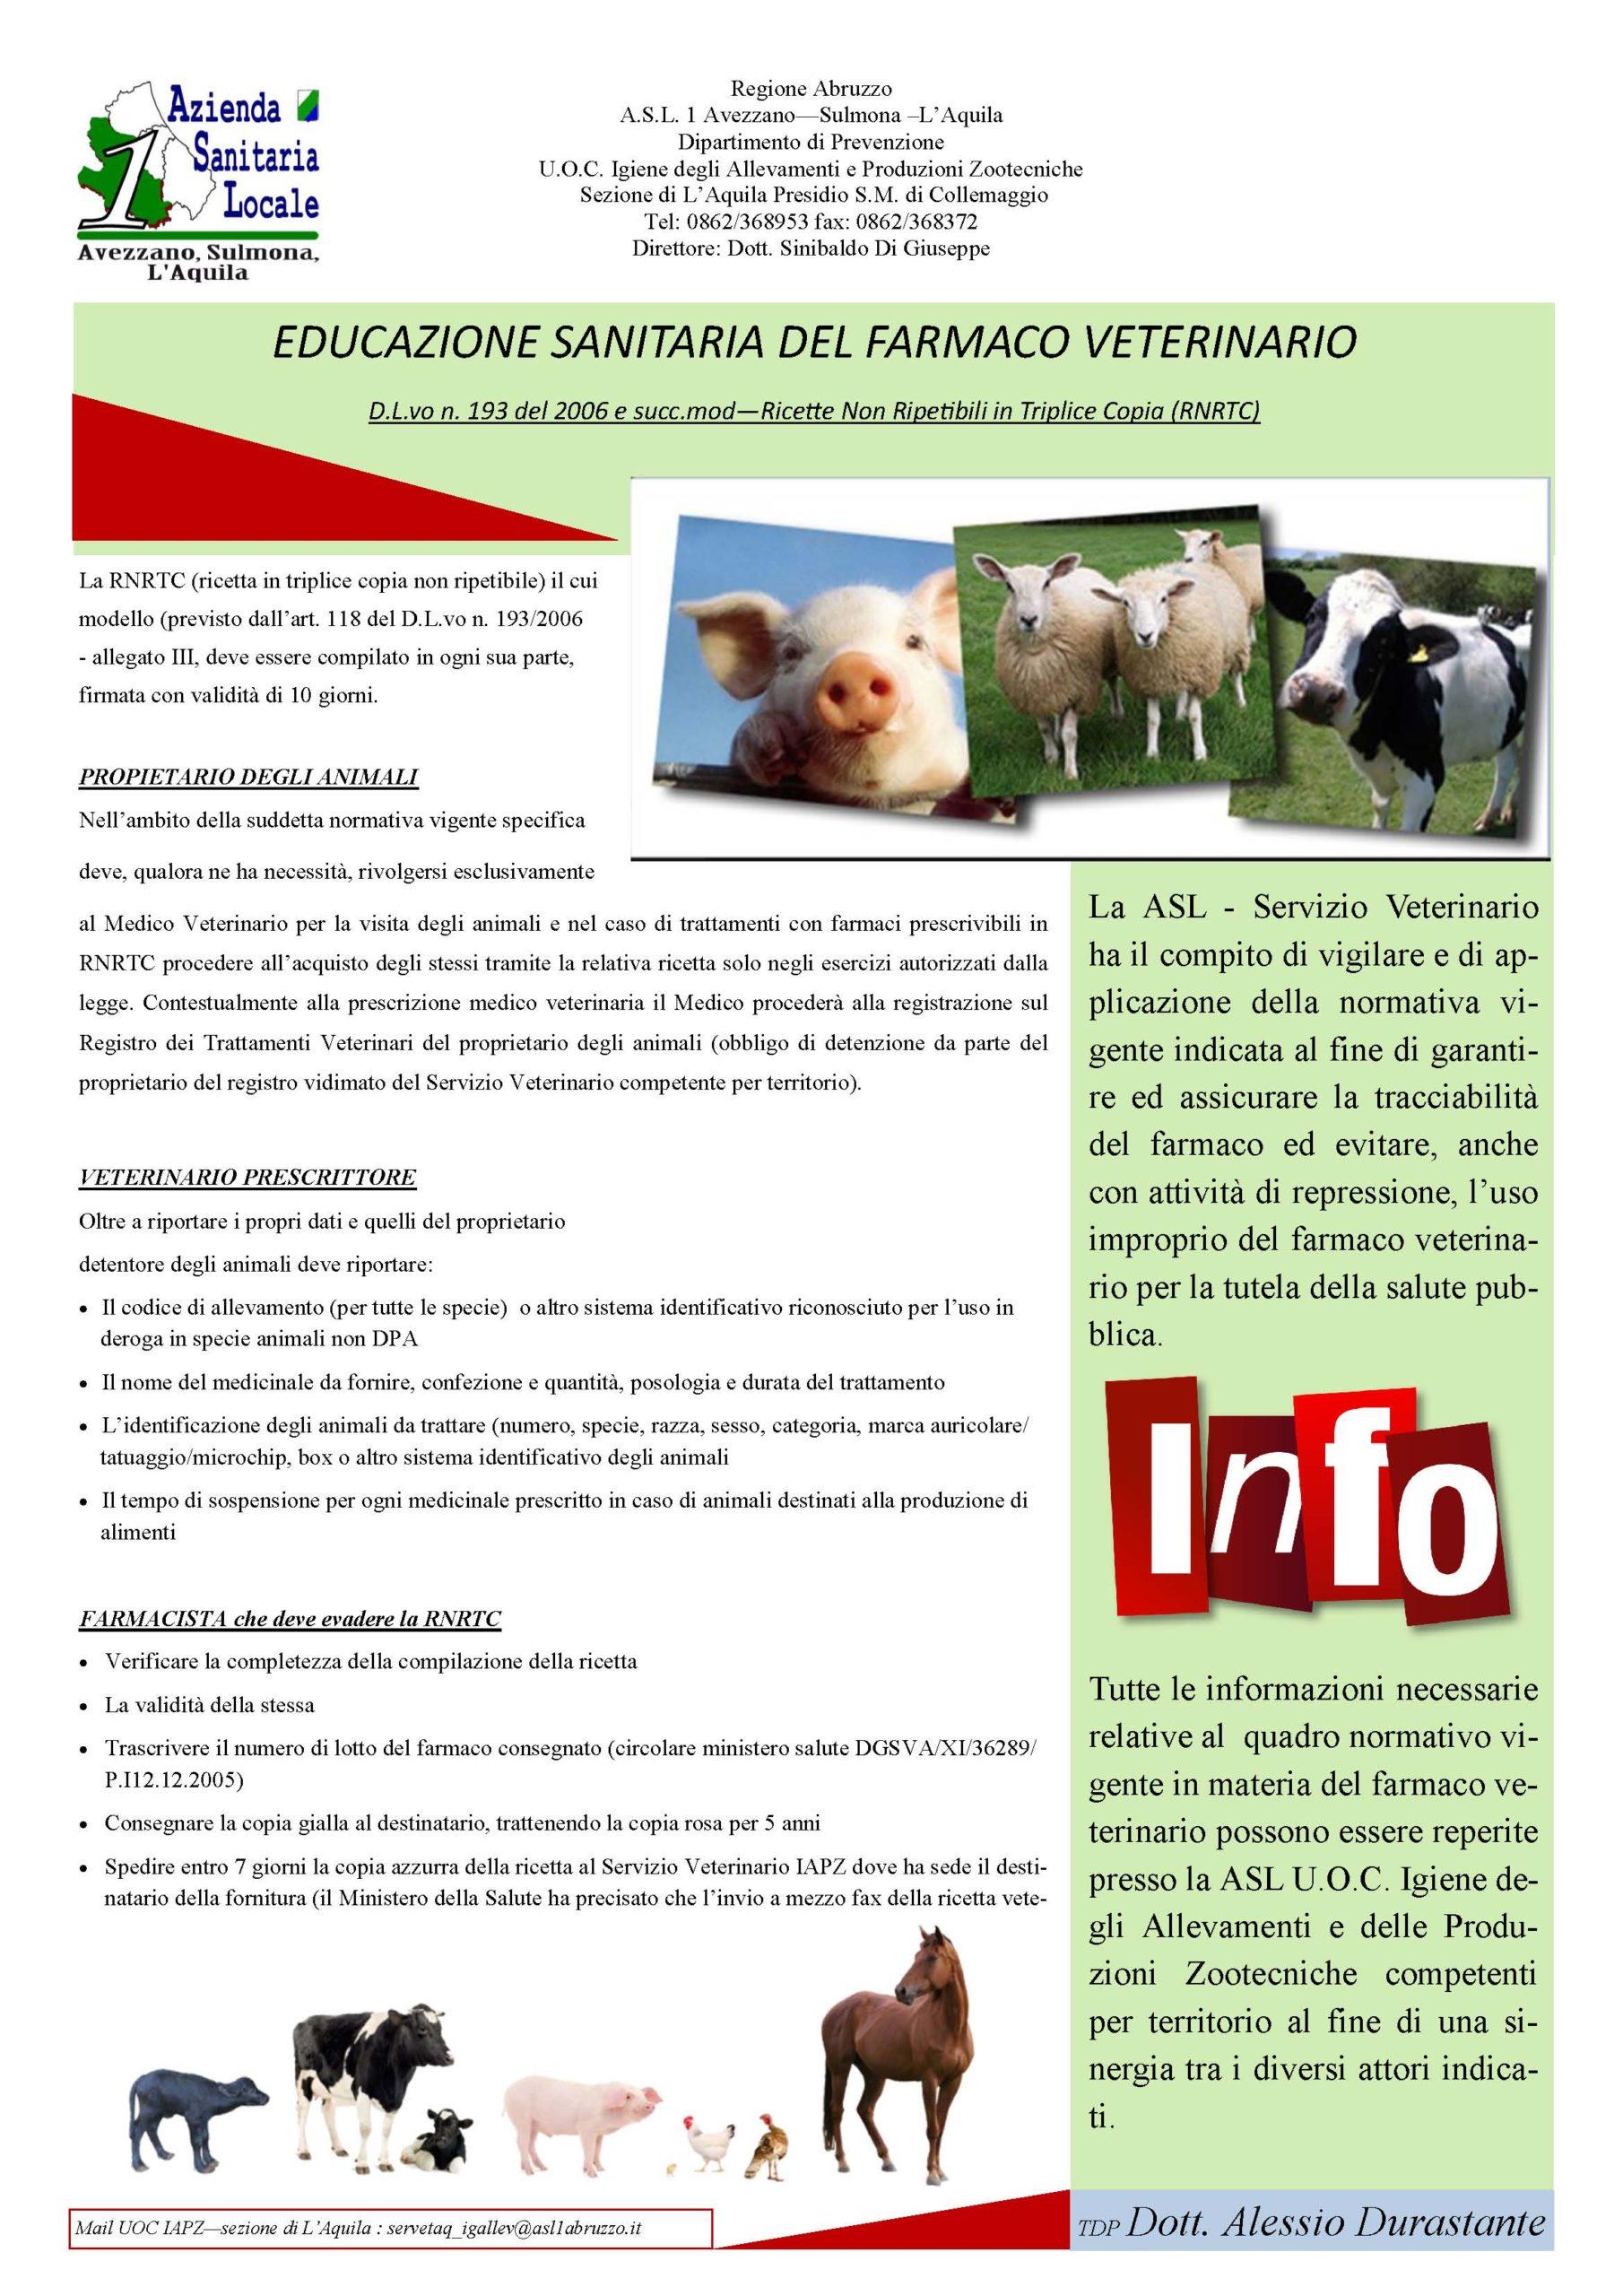 educazione sanitaria del farmaco veterinario locandina 2017